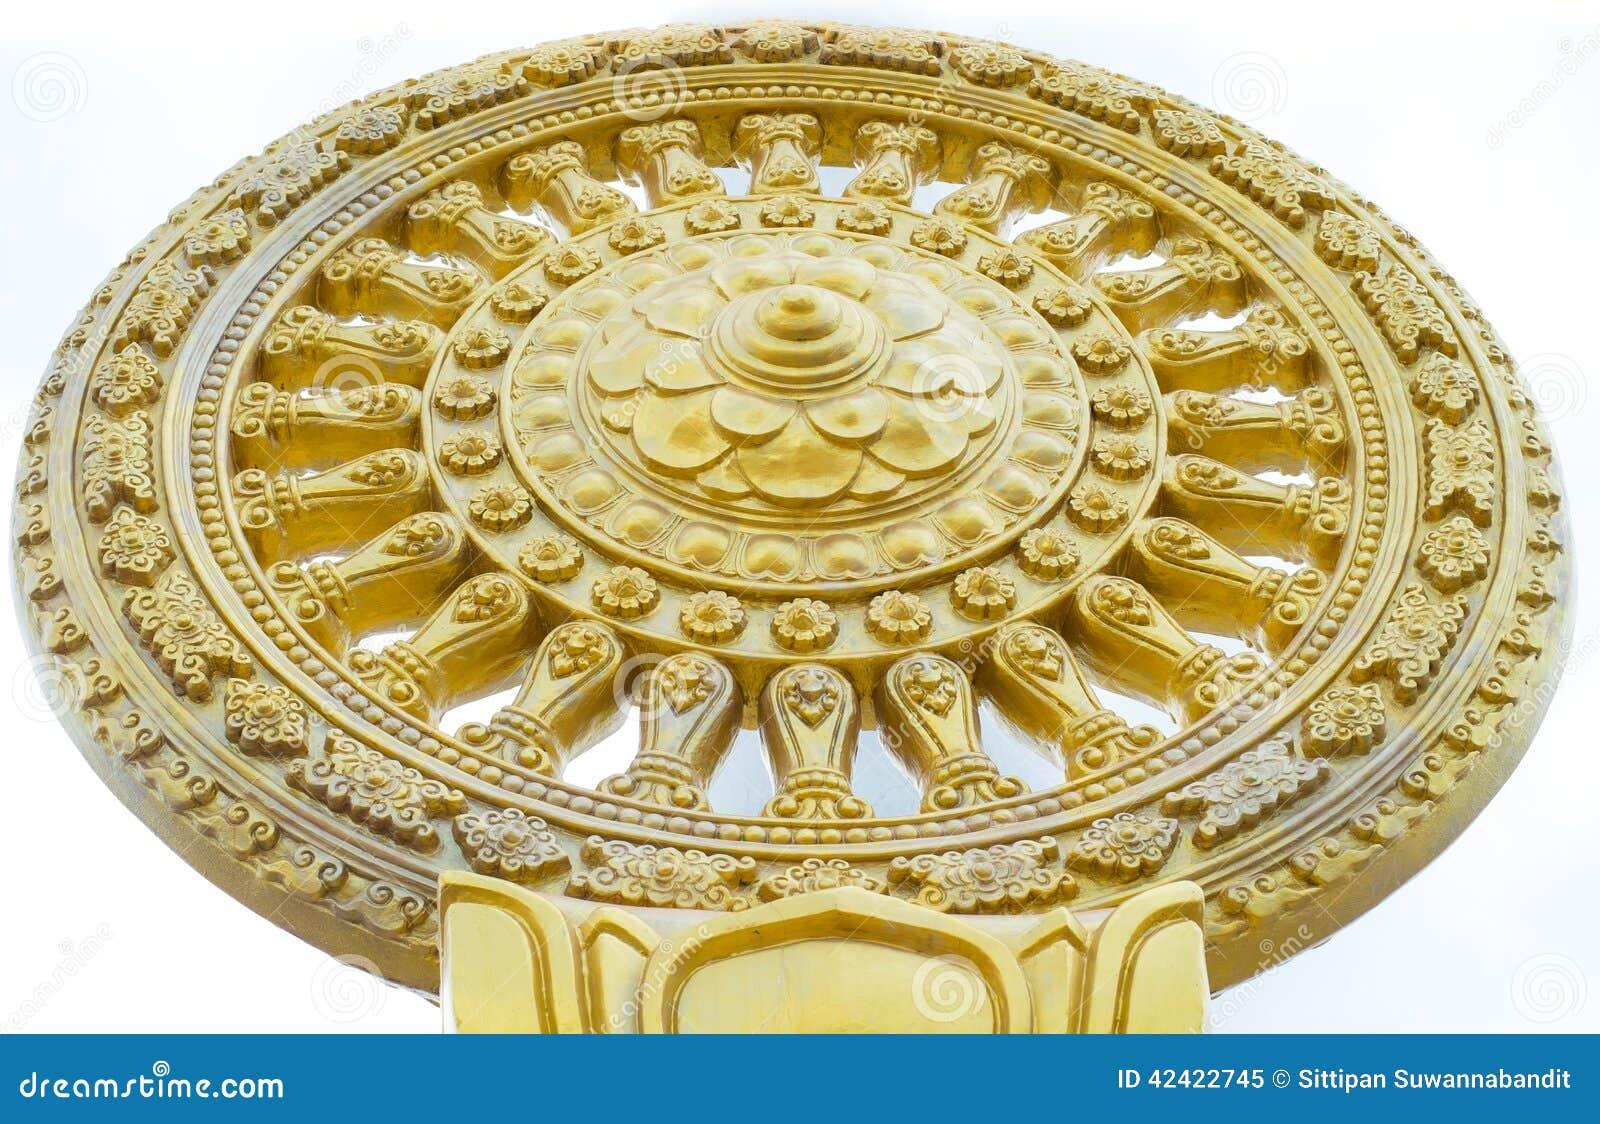 budha dharmachakra stock image image of traditional 42422745